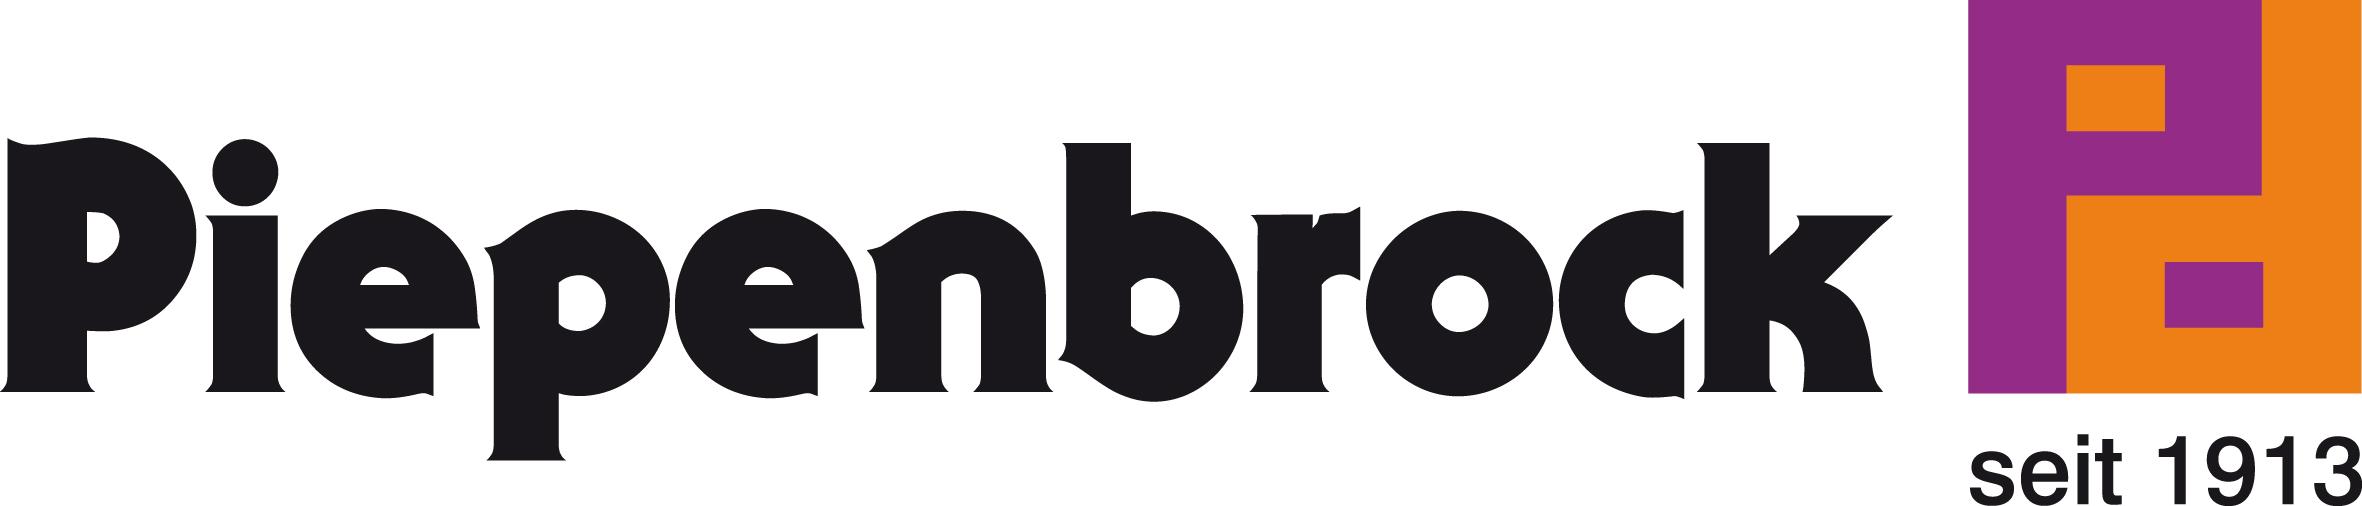 Piepenbrock Unternehmensgruppe Gmbh Co Kg